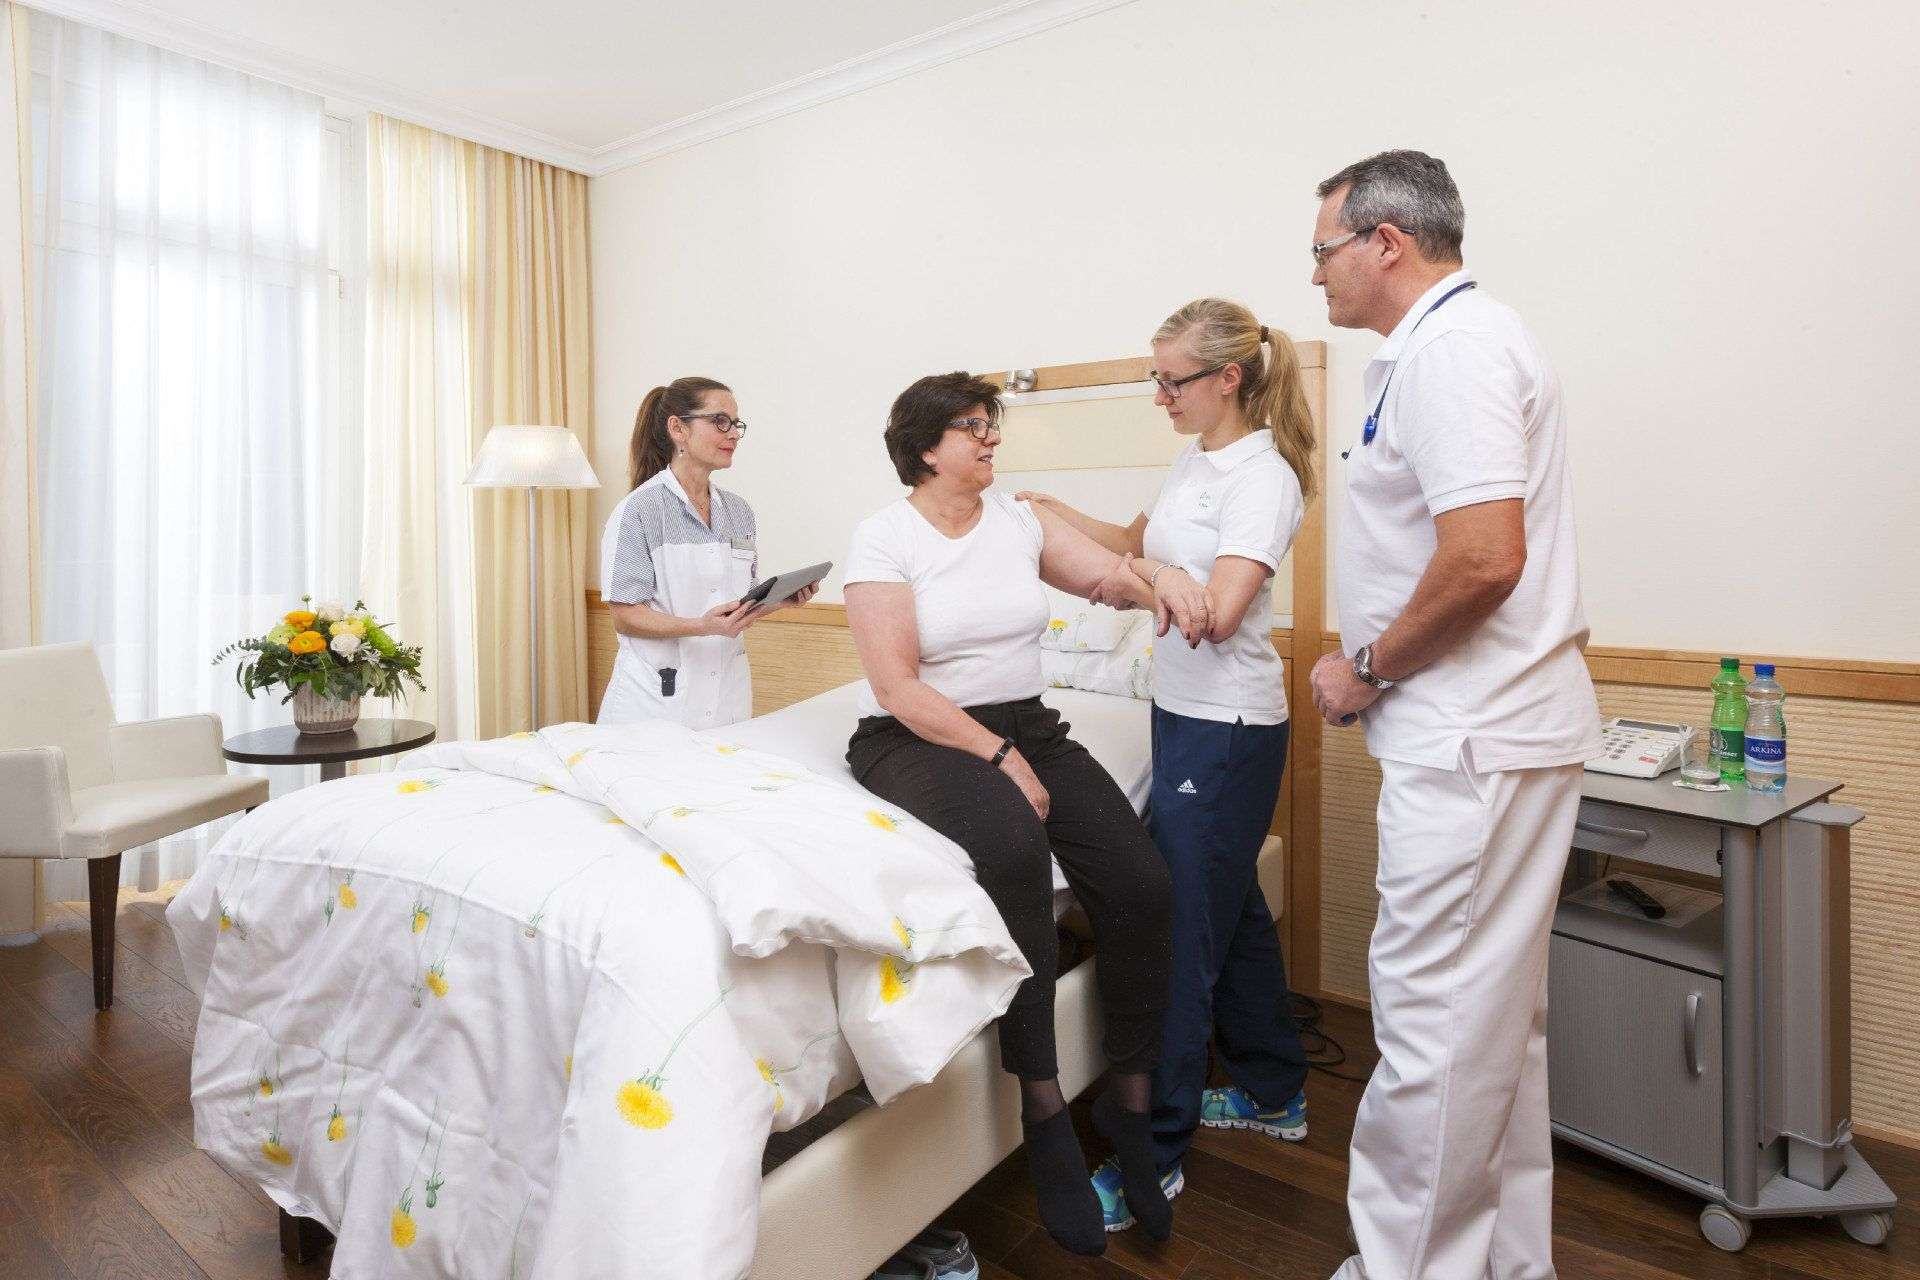 Arztvisite bei stationärer Rehabilitation